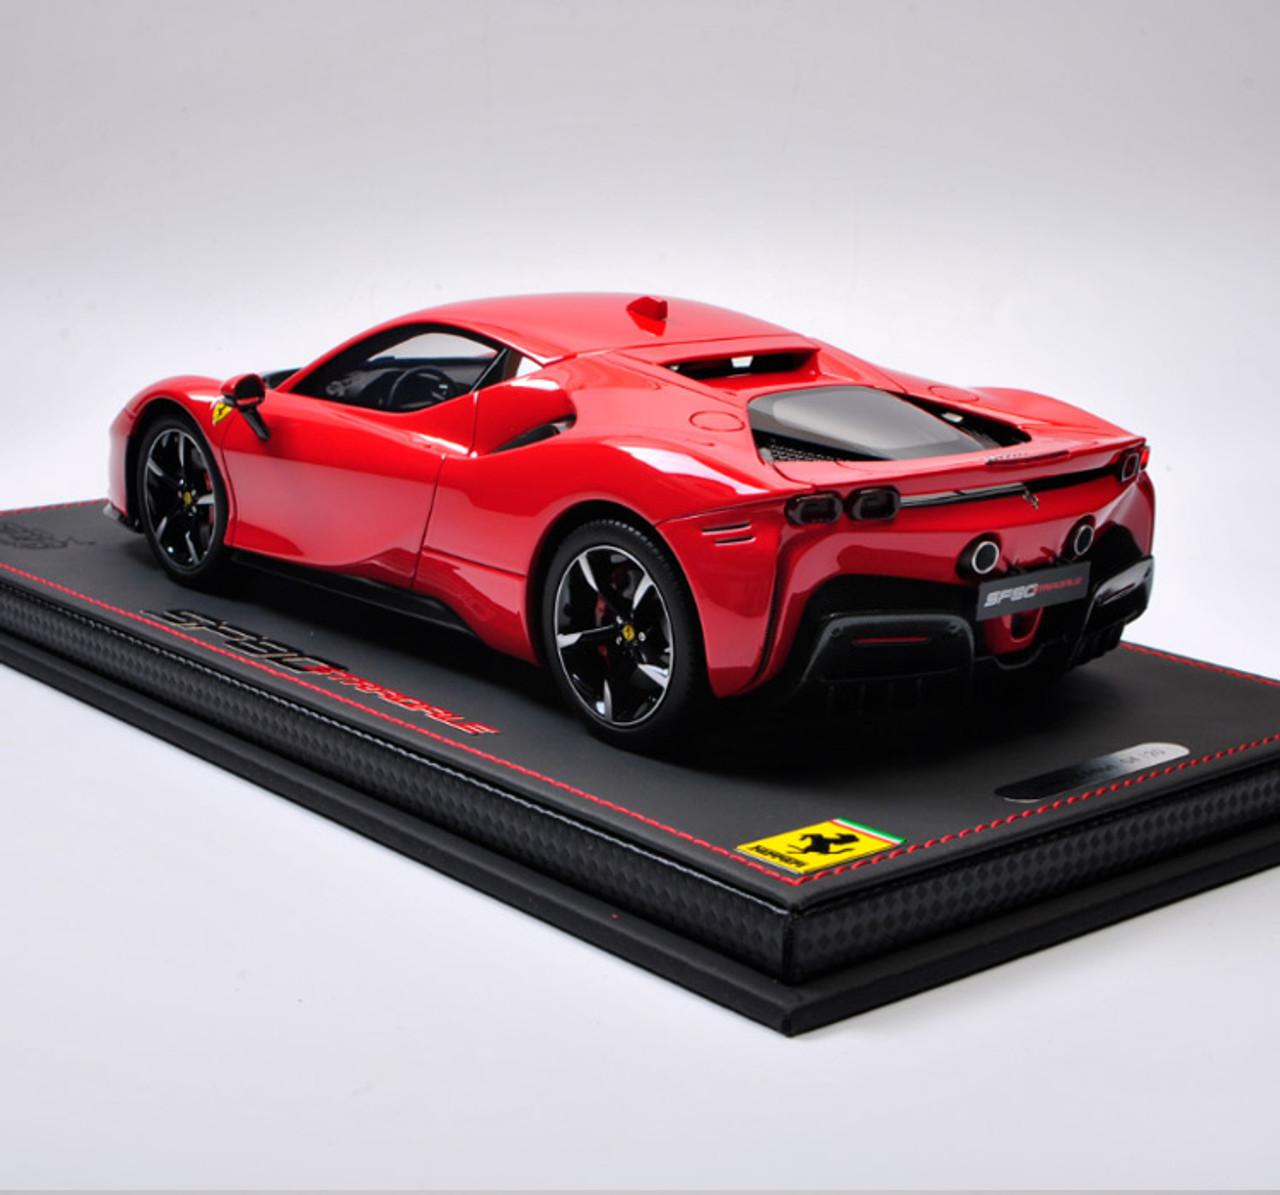 1 18 Bbr Ferrari Sf90 Stradale Red Resin Car Model Limited 20 Pieces Livecarmodel Com